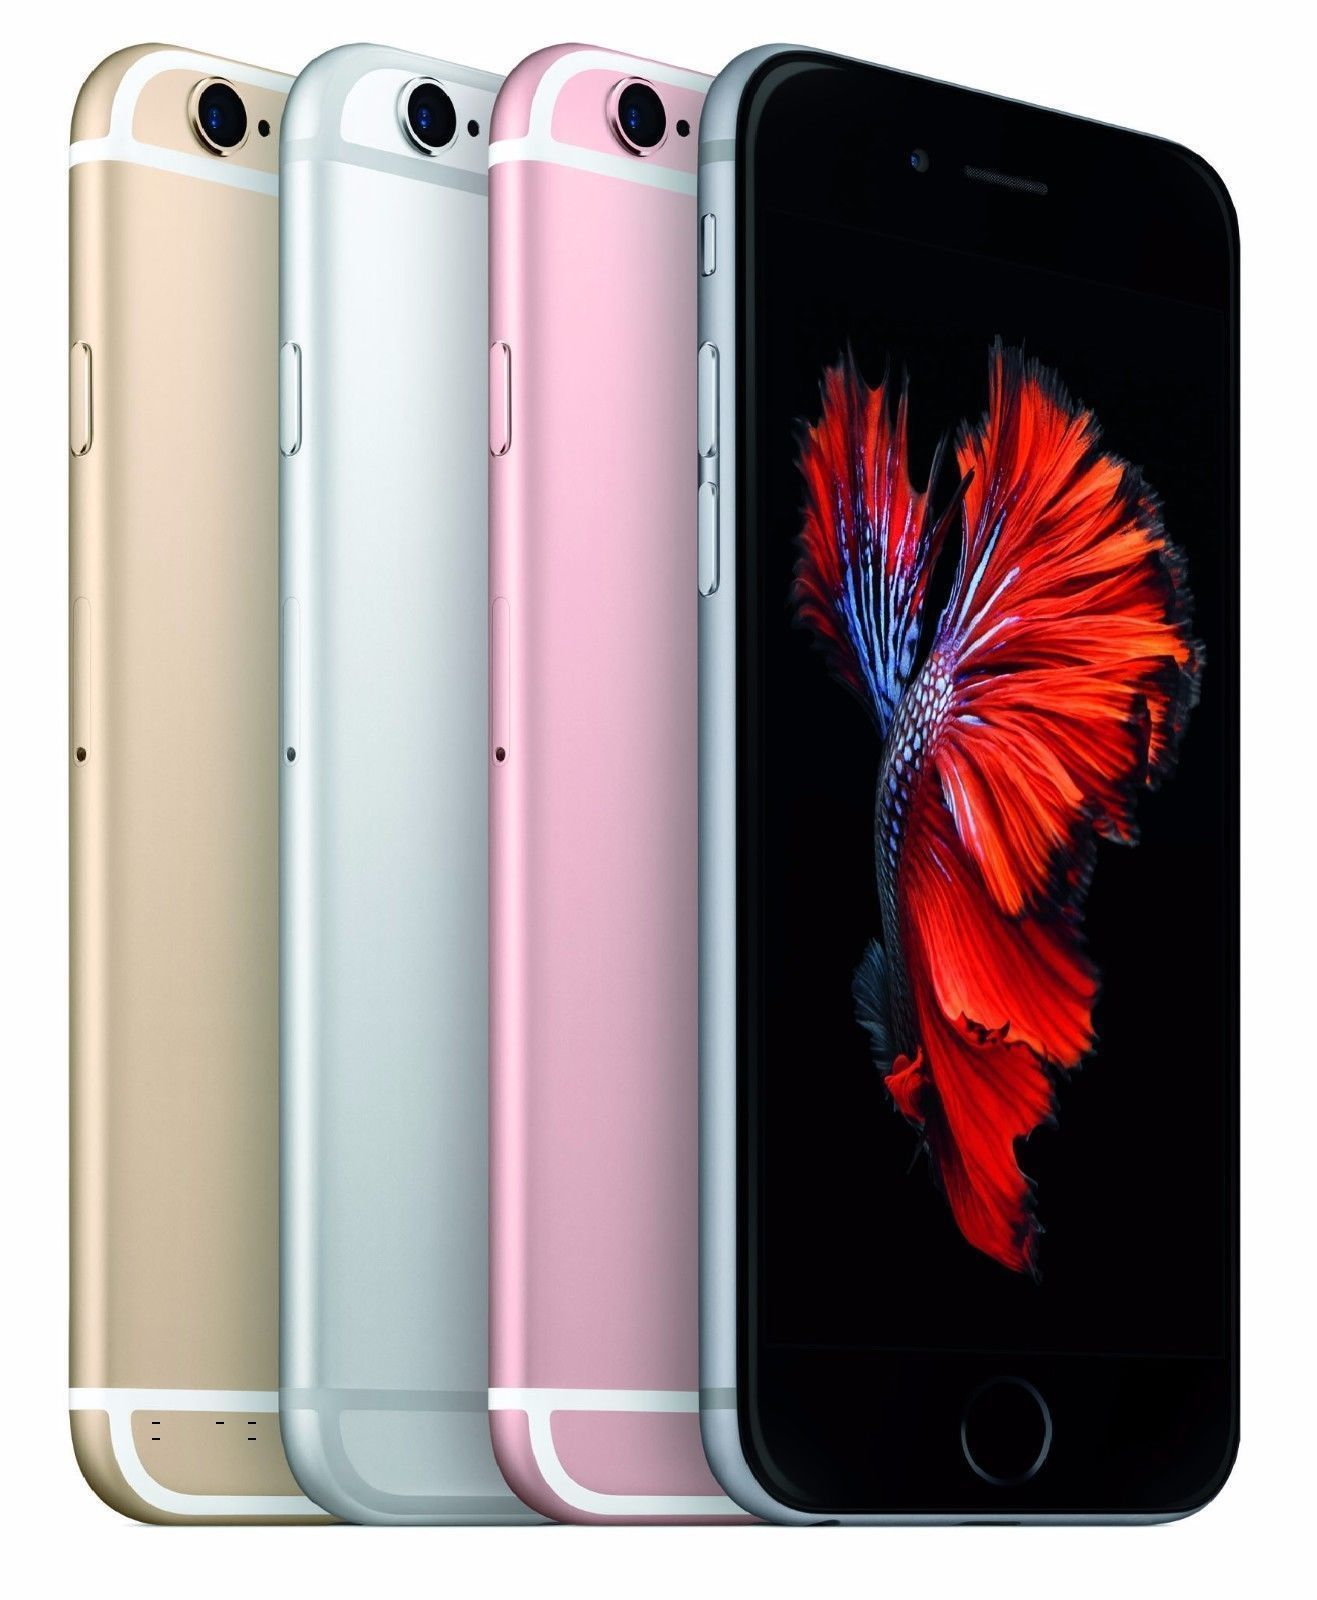 Apple iPhone 6S Factory Unlocked Gray Silver Gold No Finger Sensor